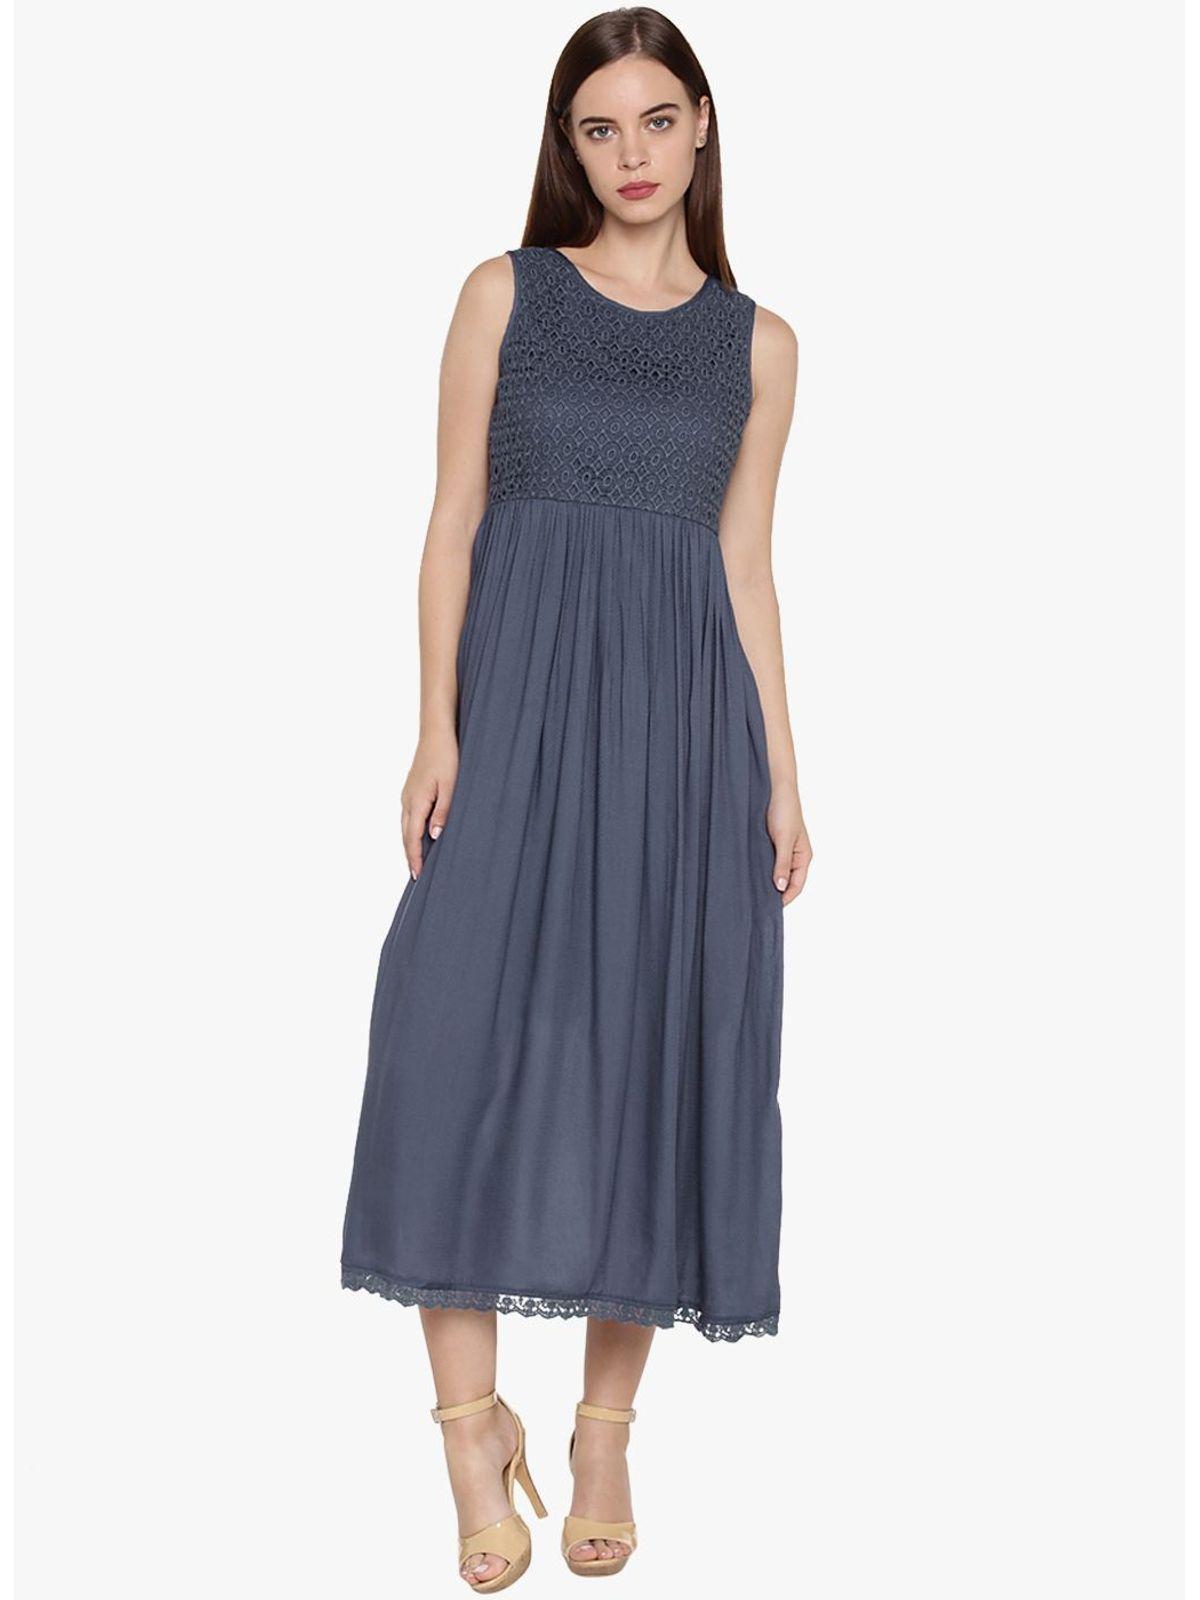 BELLA MID LENGTH DRESS